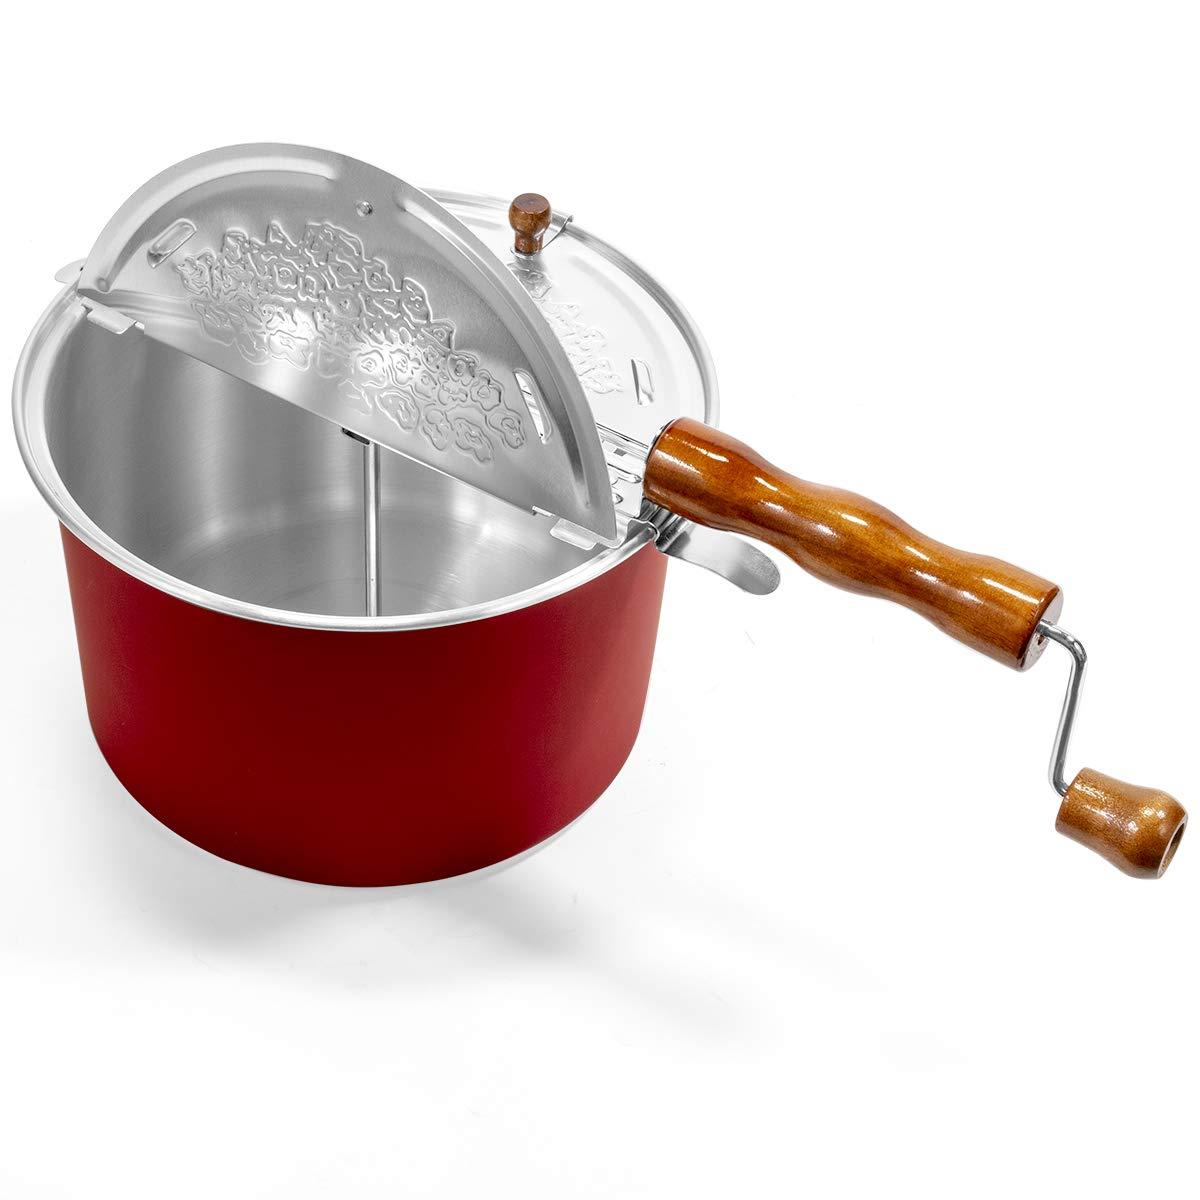 Kitchen & Dining Red Barton Popcorn Maker Stovetop Pop Popcorn ...